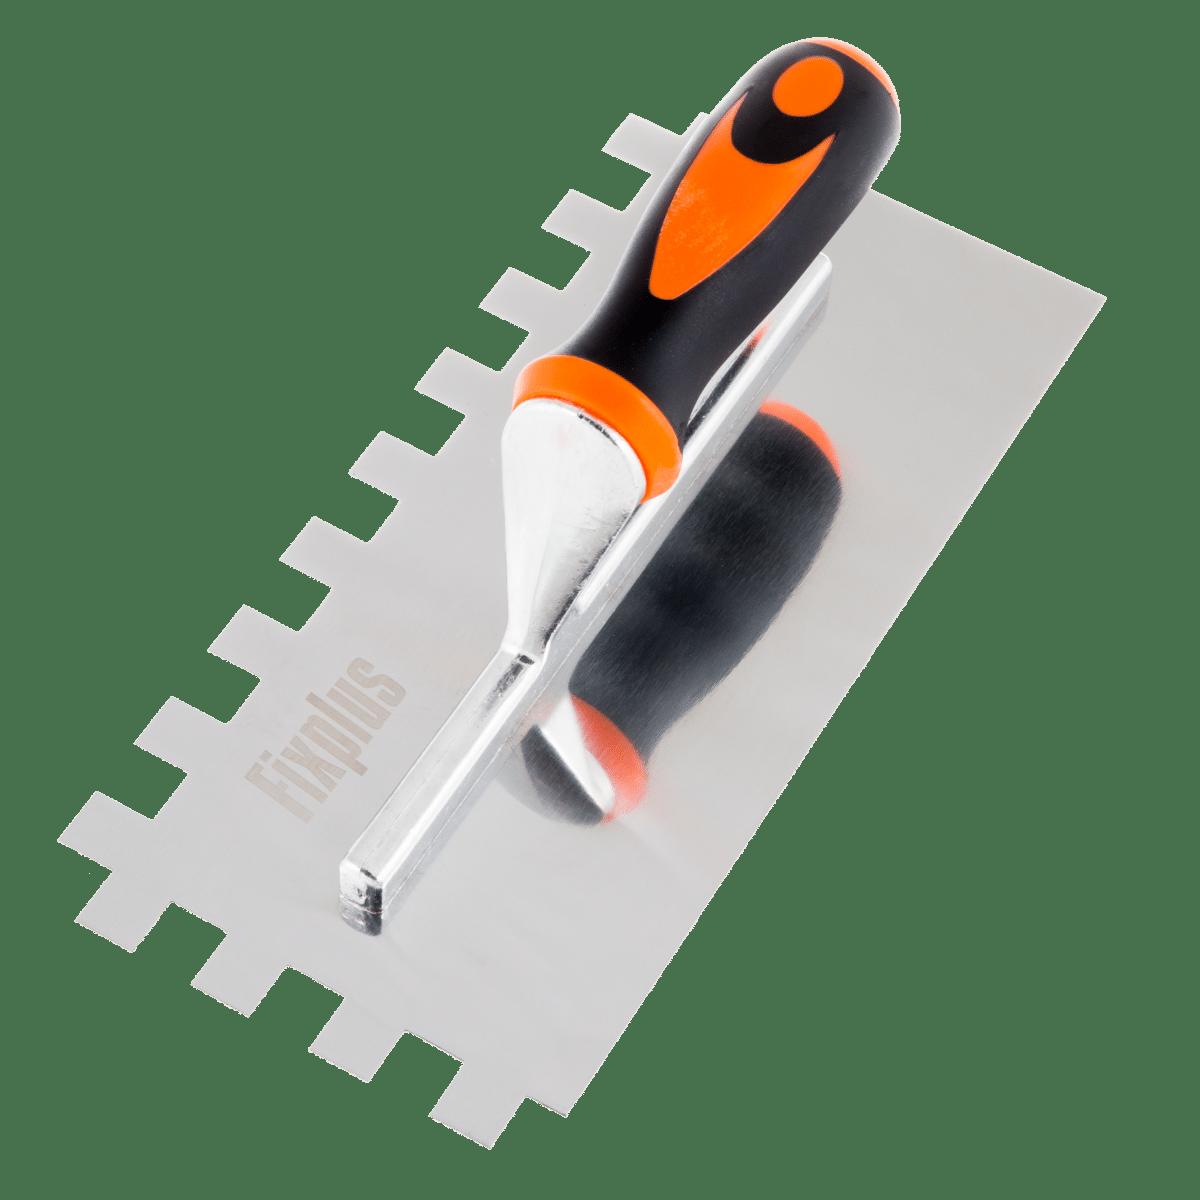 Fixplus lijmspaan